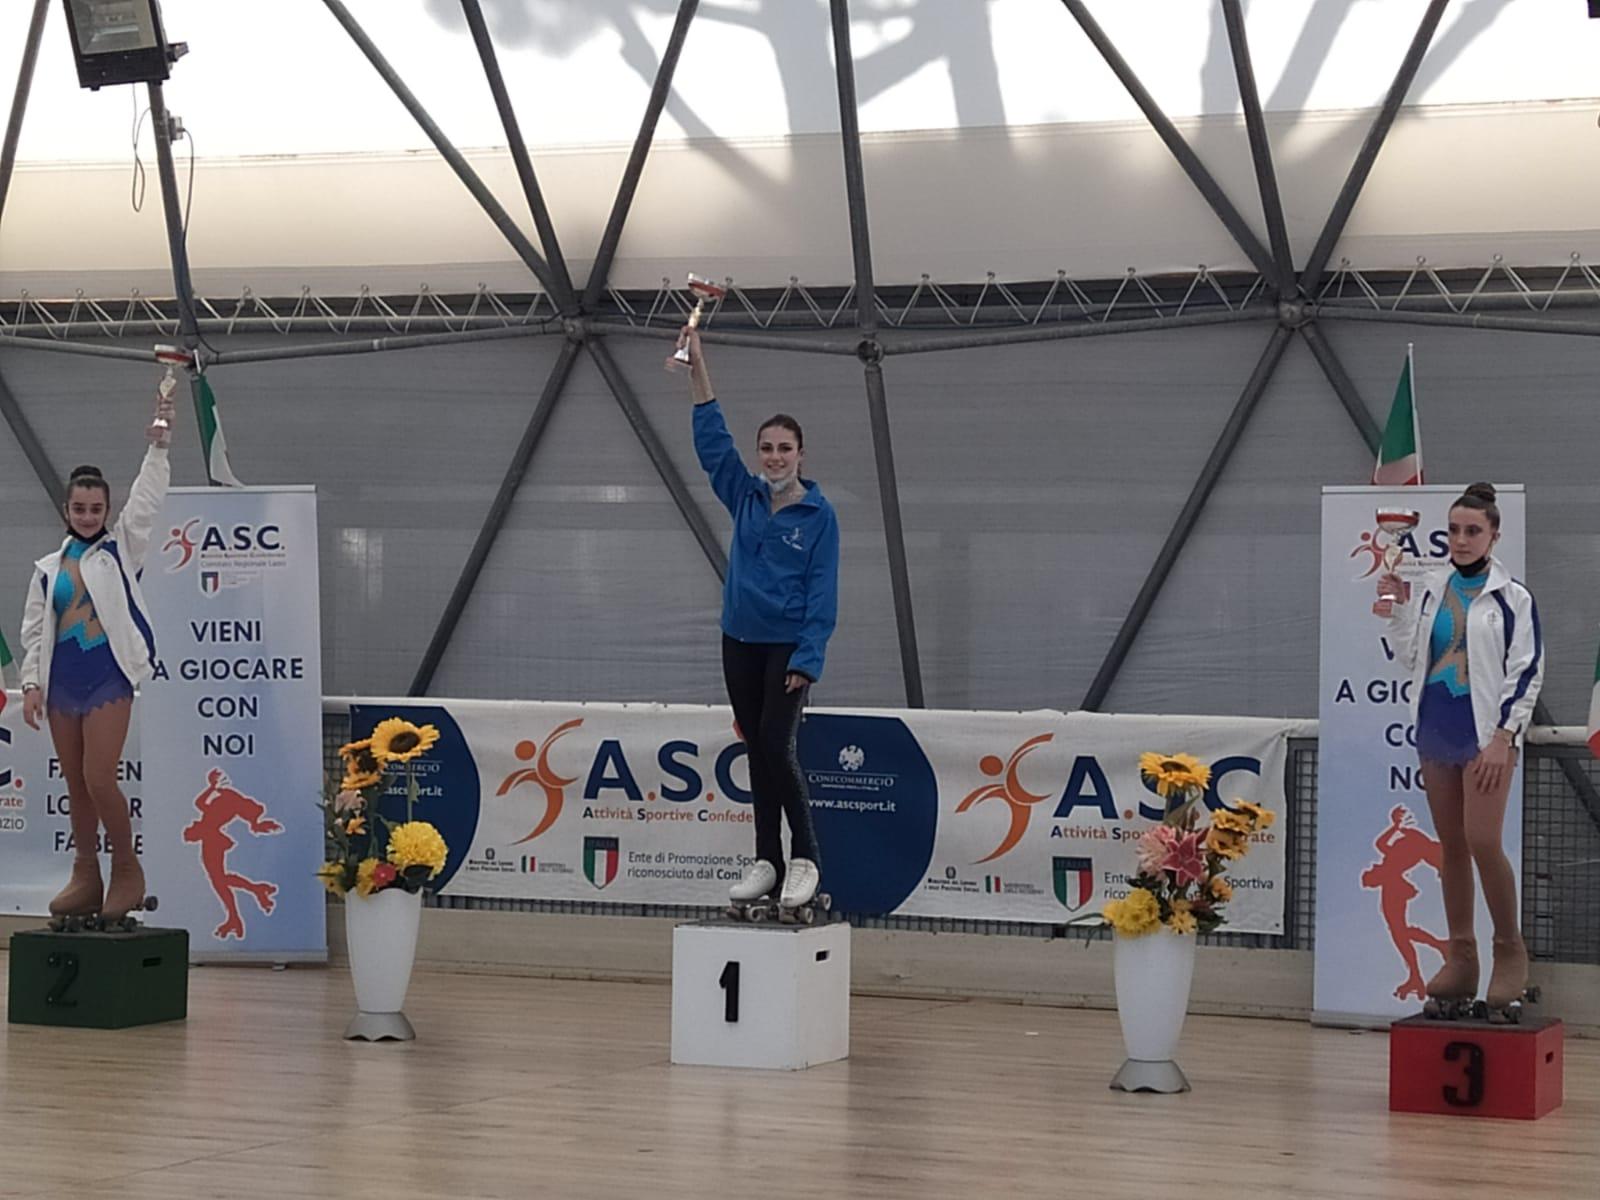 Cv Skating, le Roller Fairies fanno il pieno di medaglie al Trofeo Asc